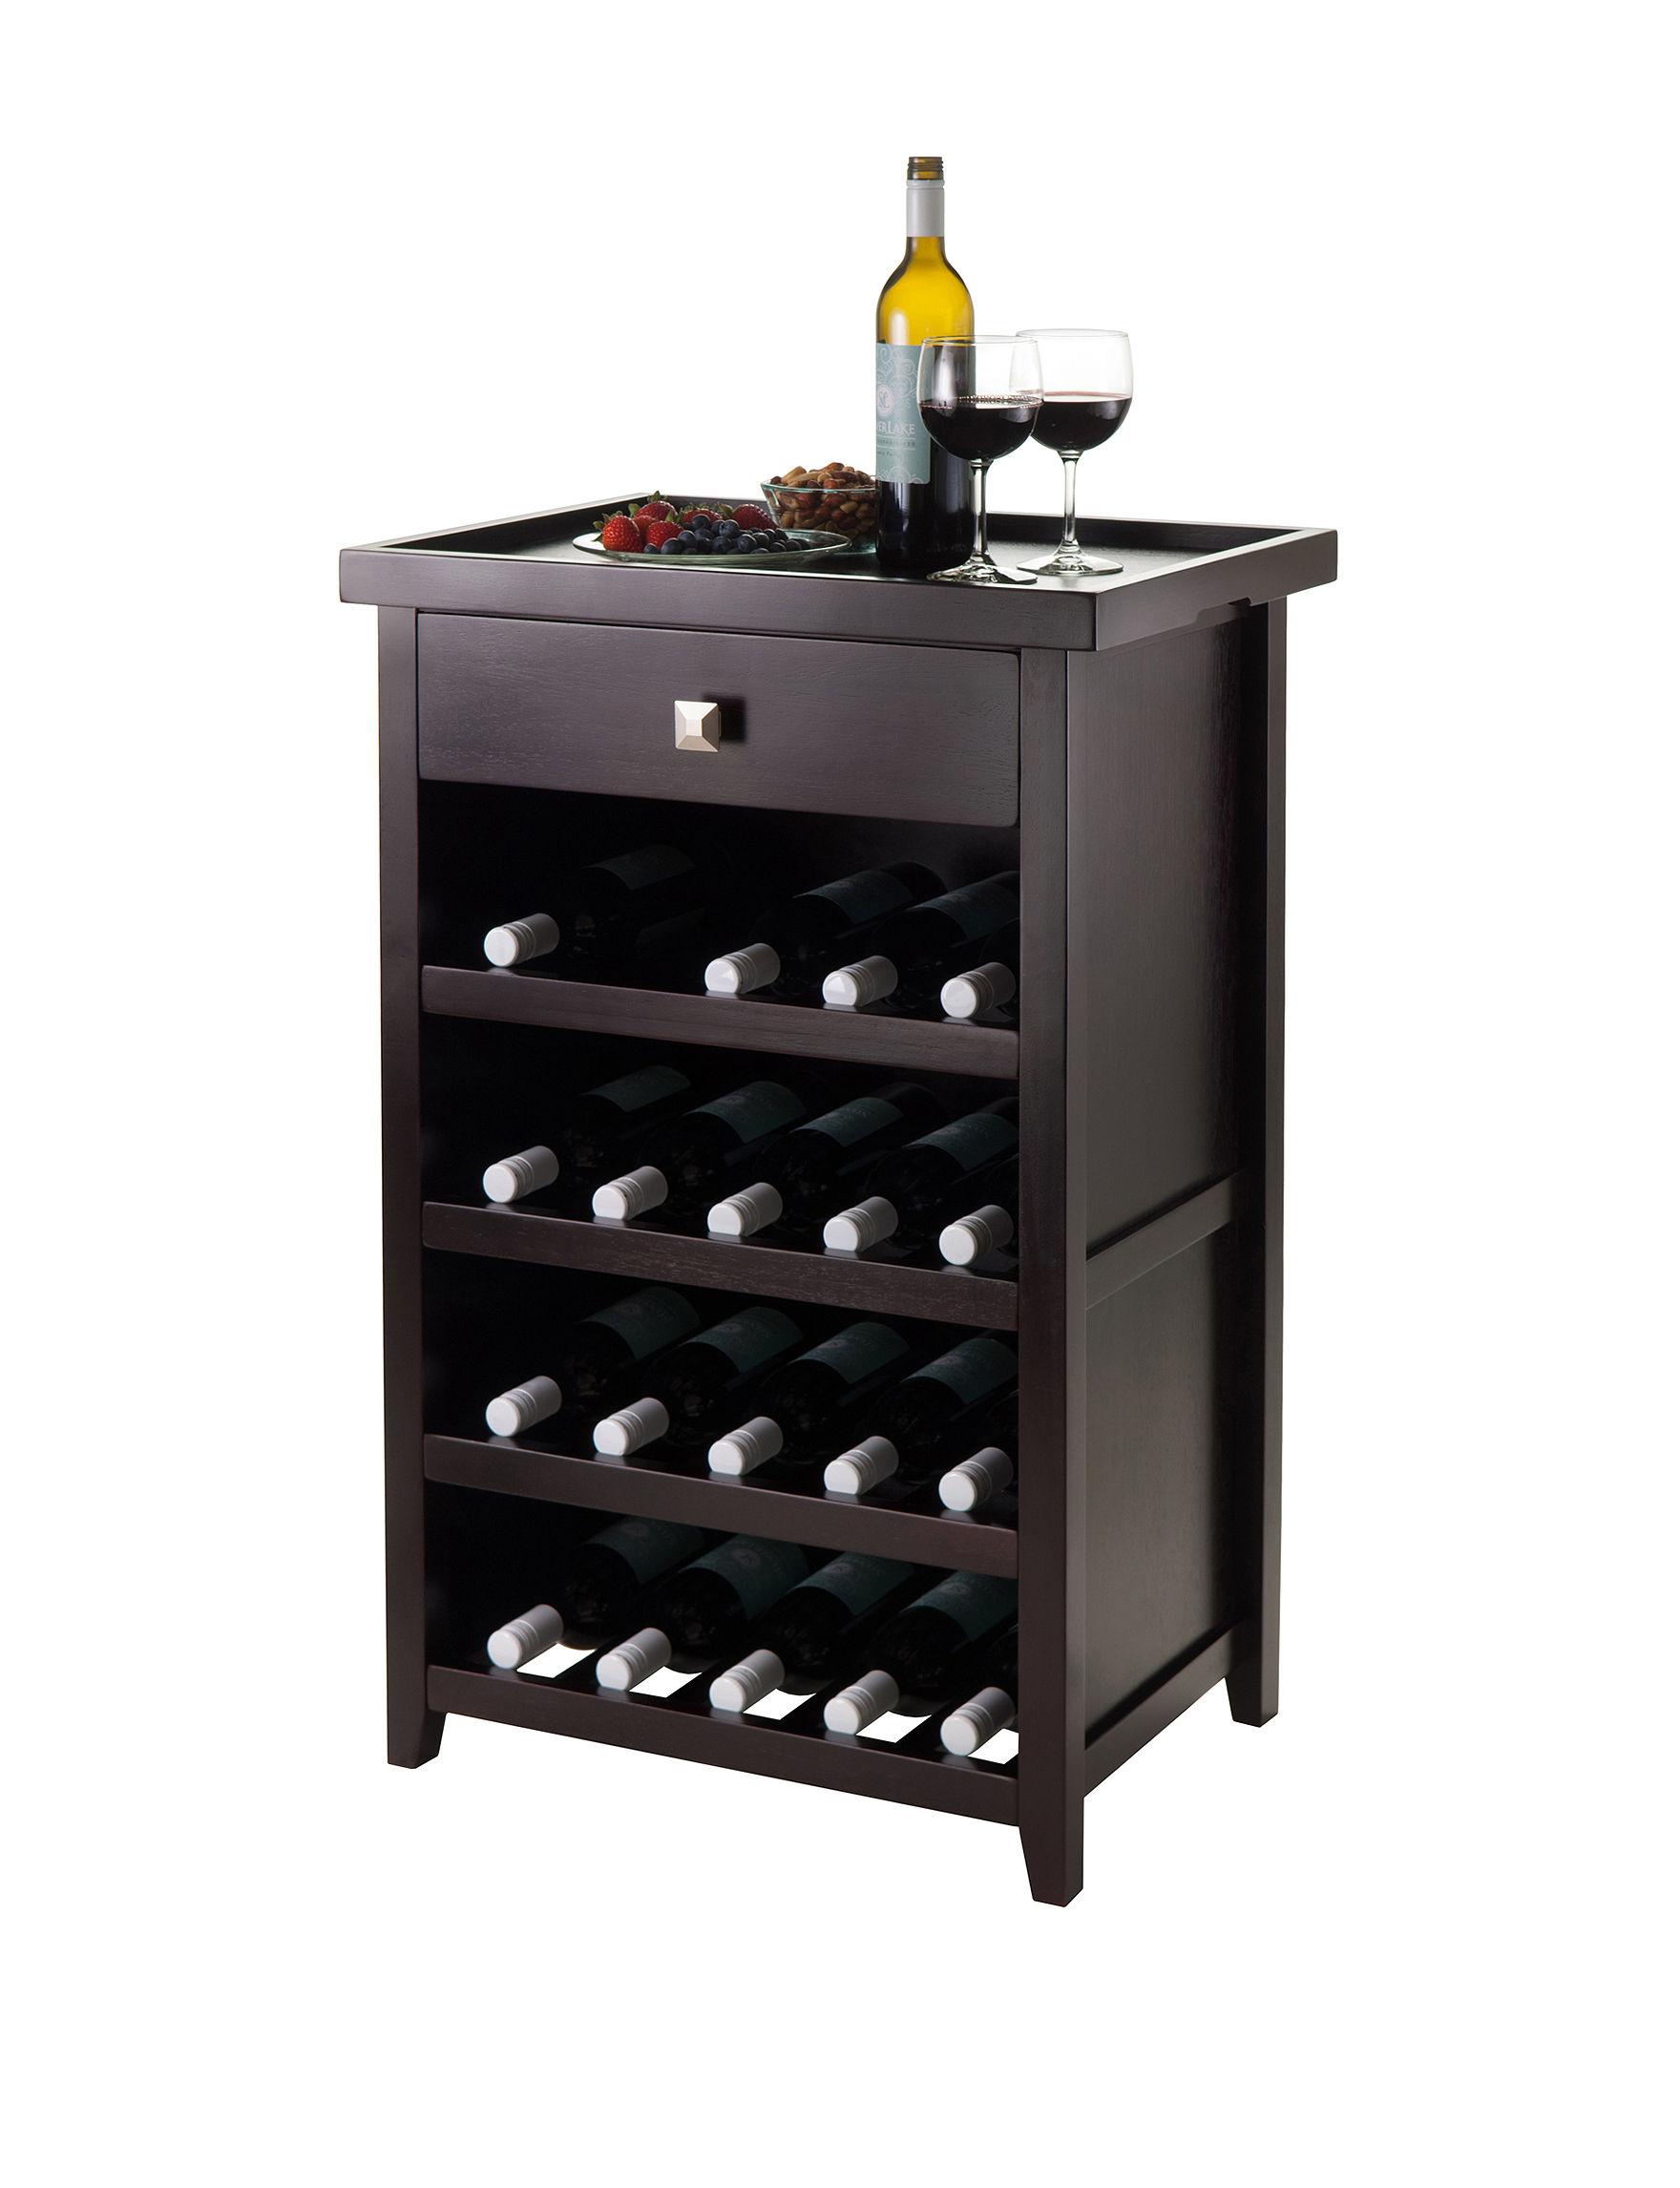 Winsome Brown Bar & Wine Storage Living Room Furniture